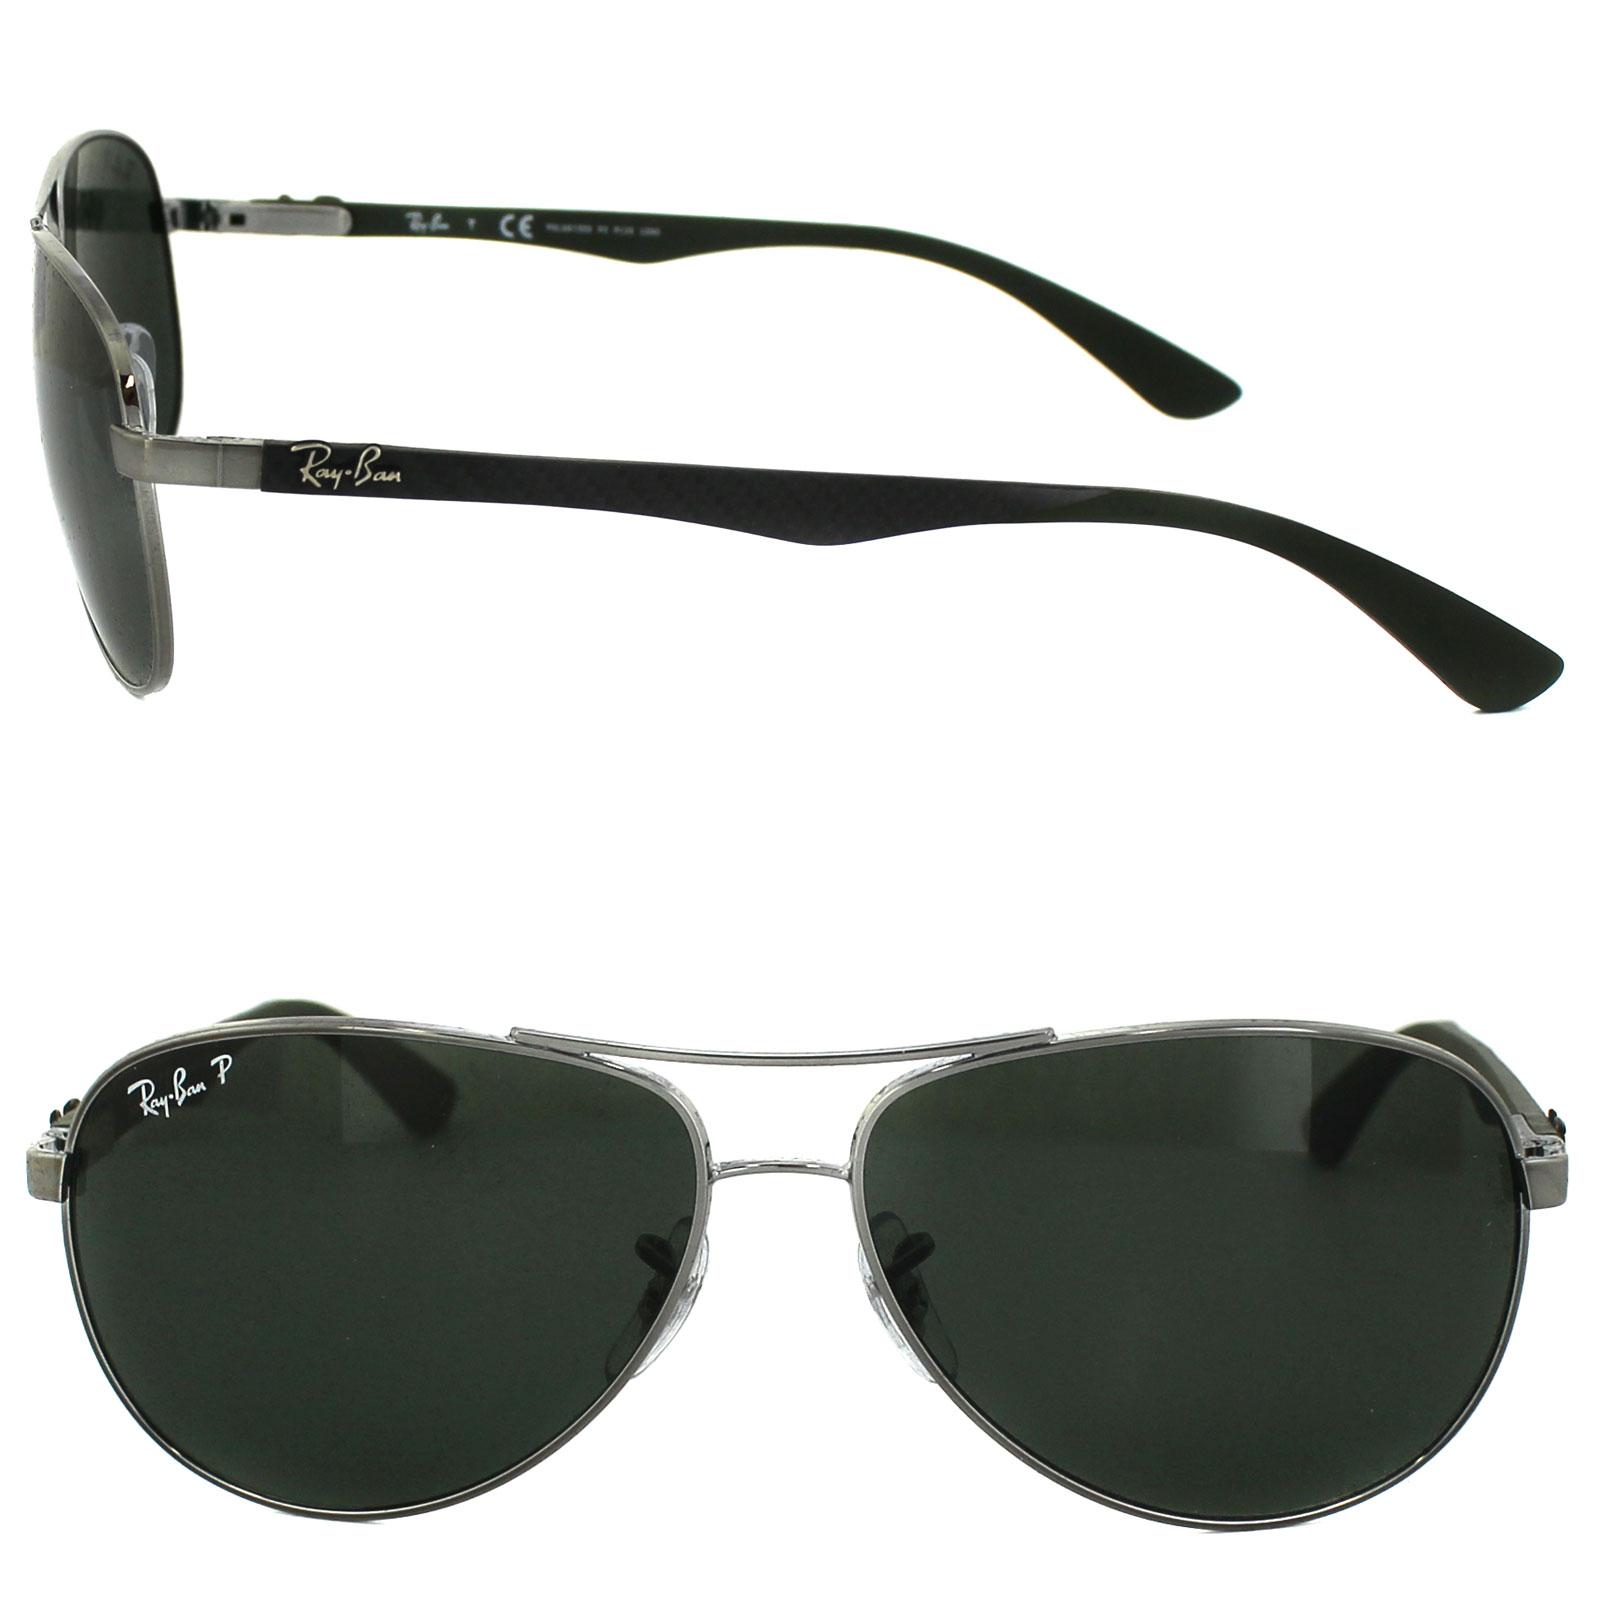 0d77735b6db ... ireland sentinel ray ban sunglasses 8313 004 n5 gunmetal green  polarized b2b0b 48645